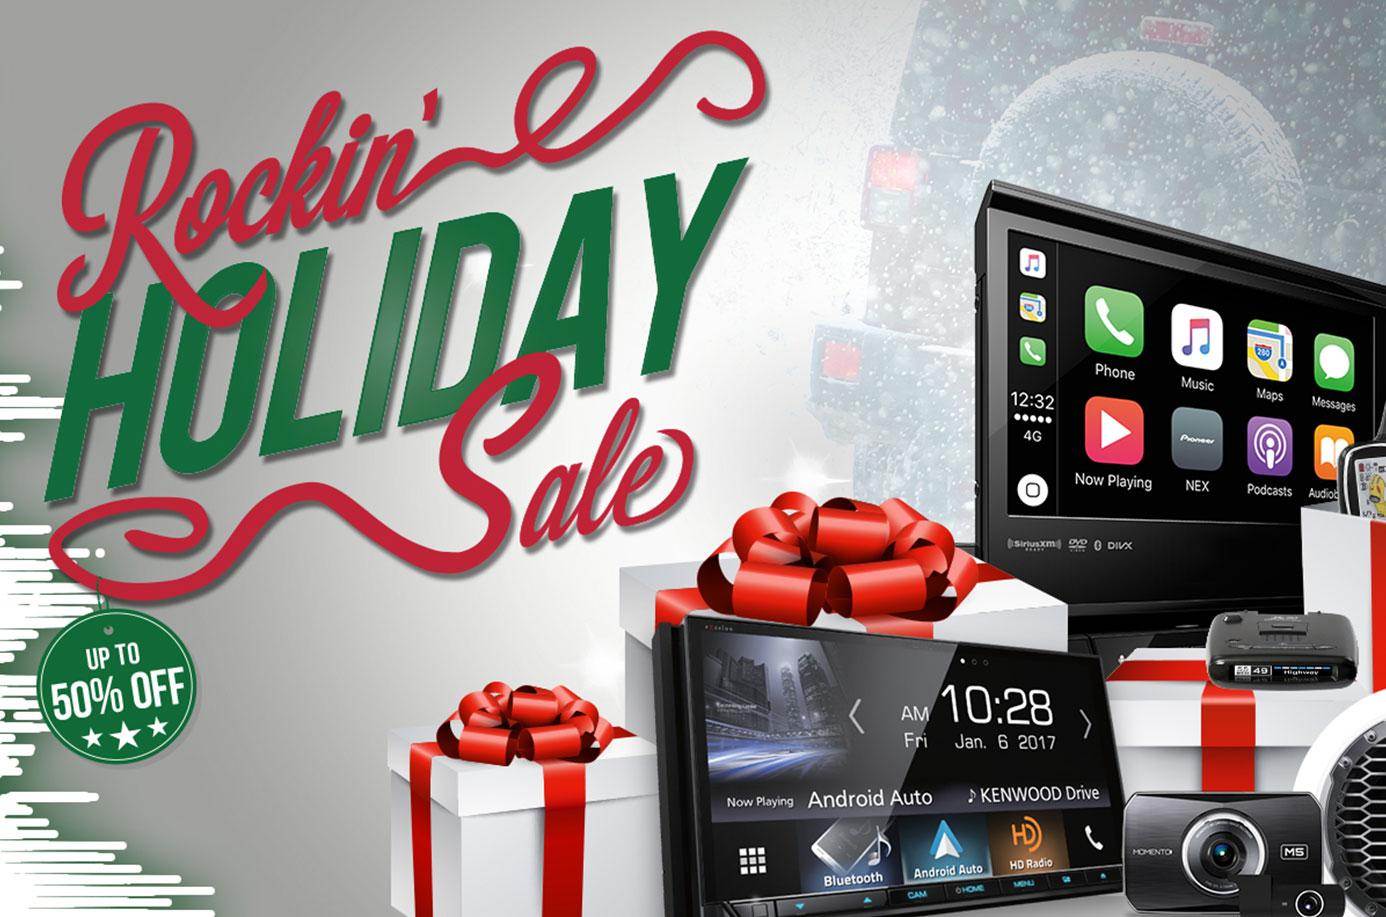 Rocking Holiday Sale